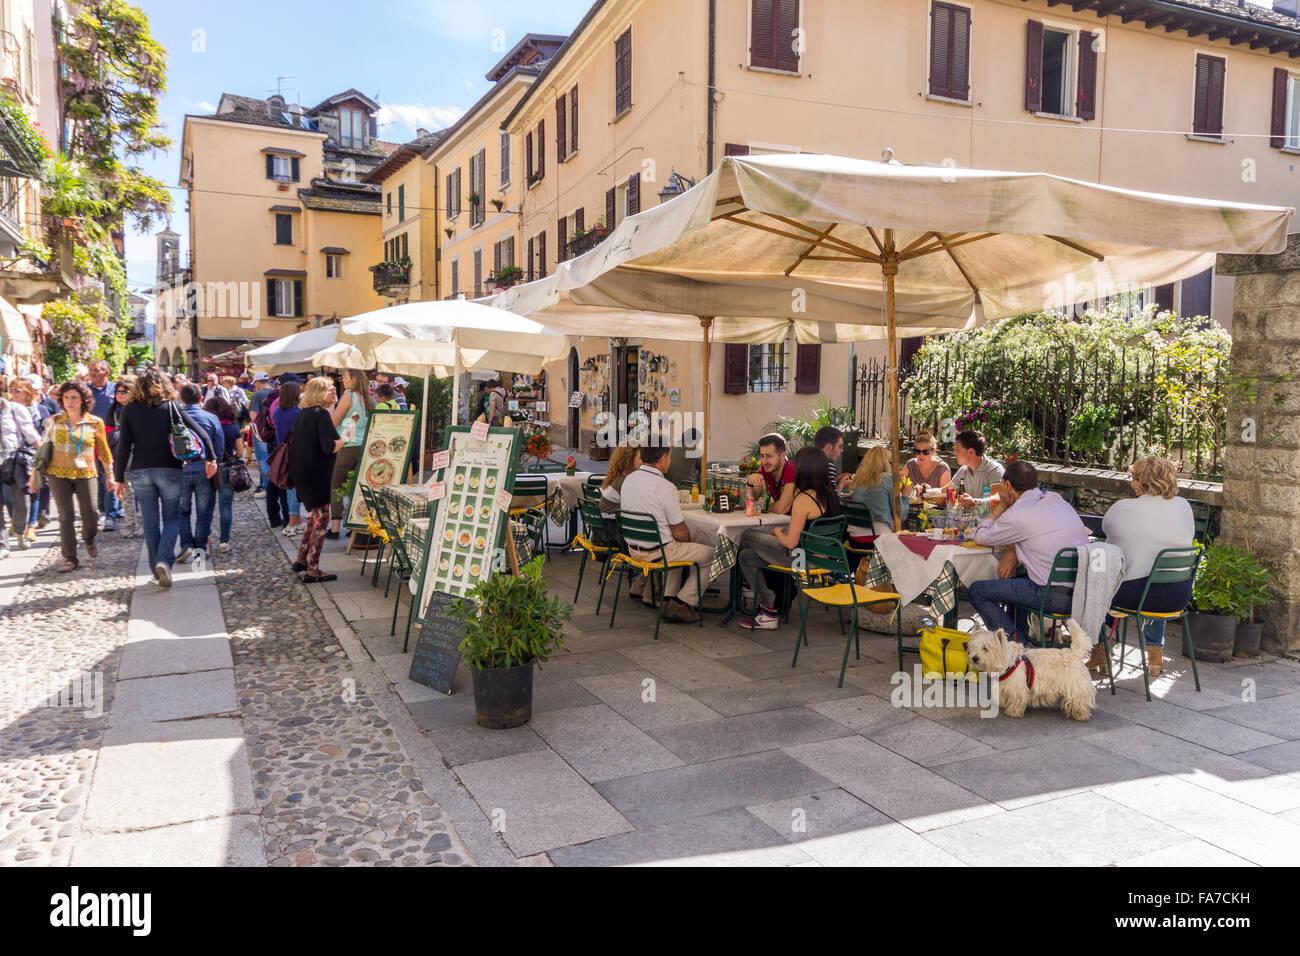 Italy, Piedmont, Orta lake, Orta San Giulio, people at restaurant - Stock Image